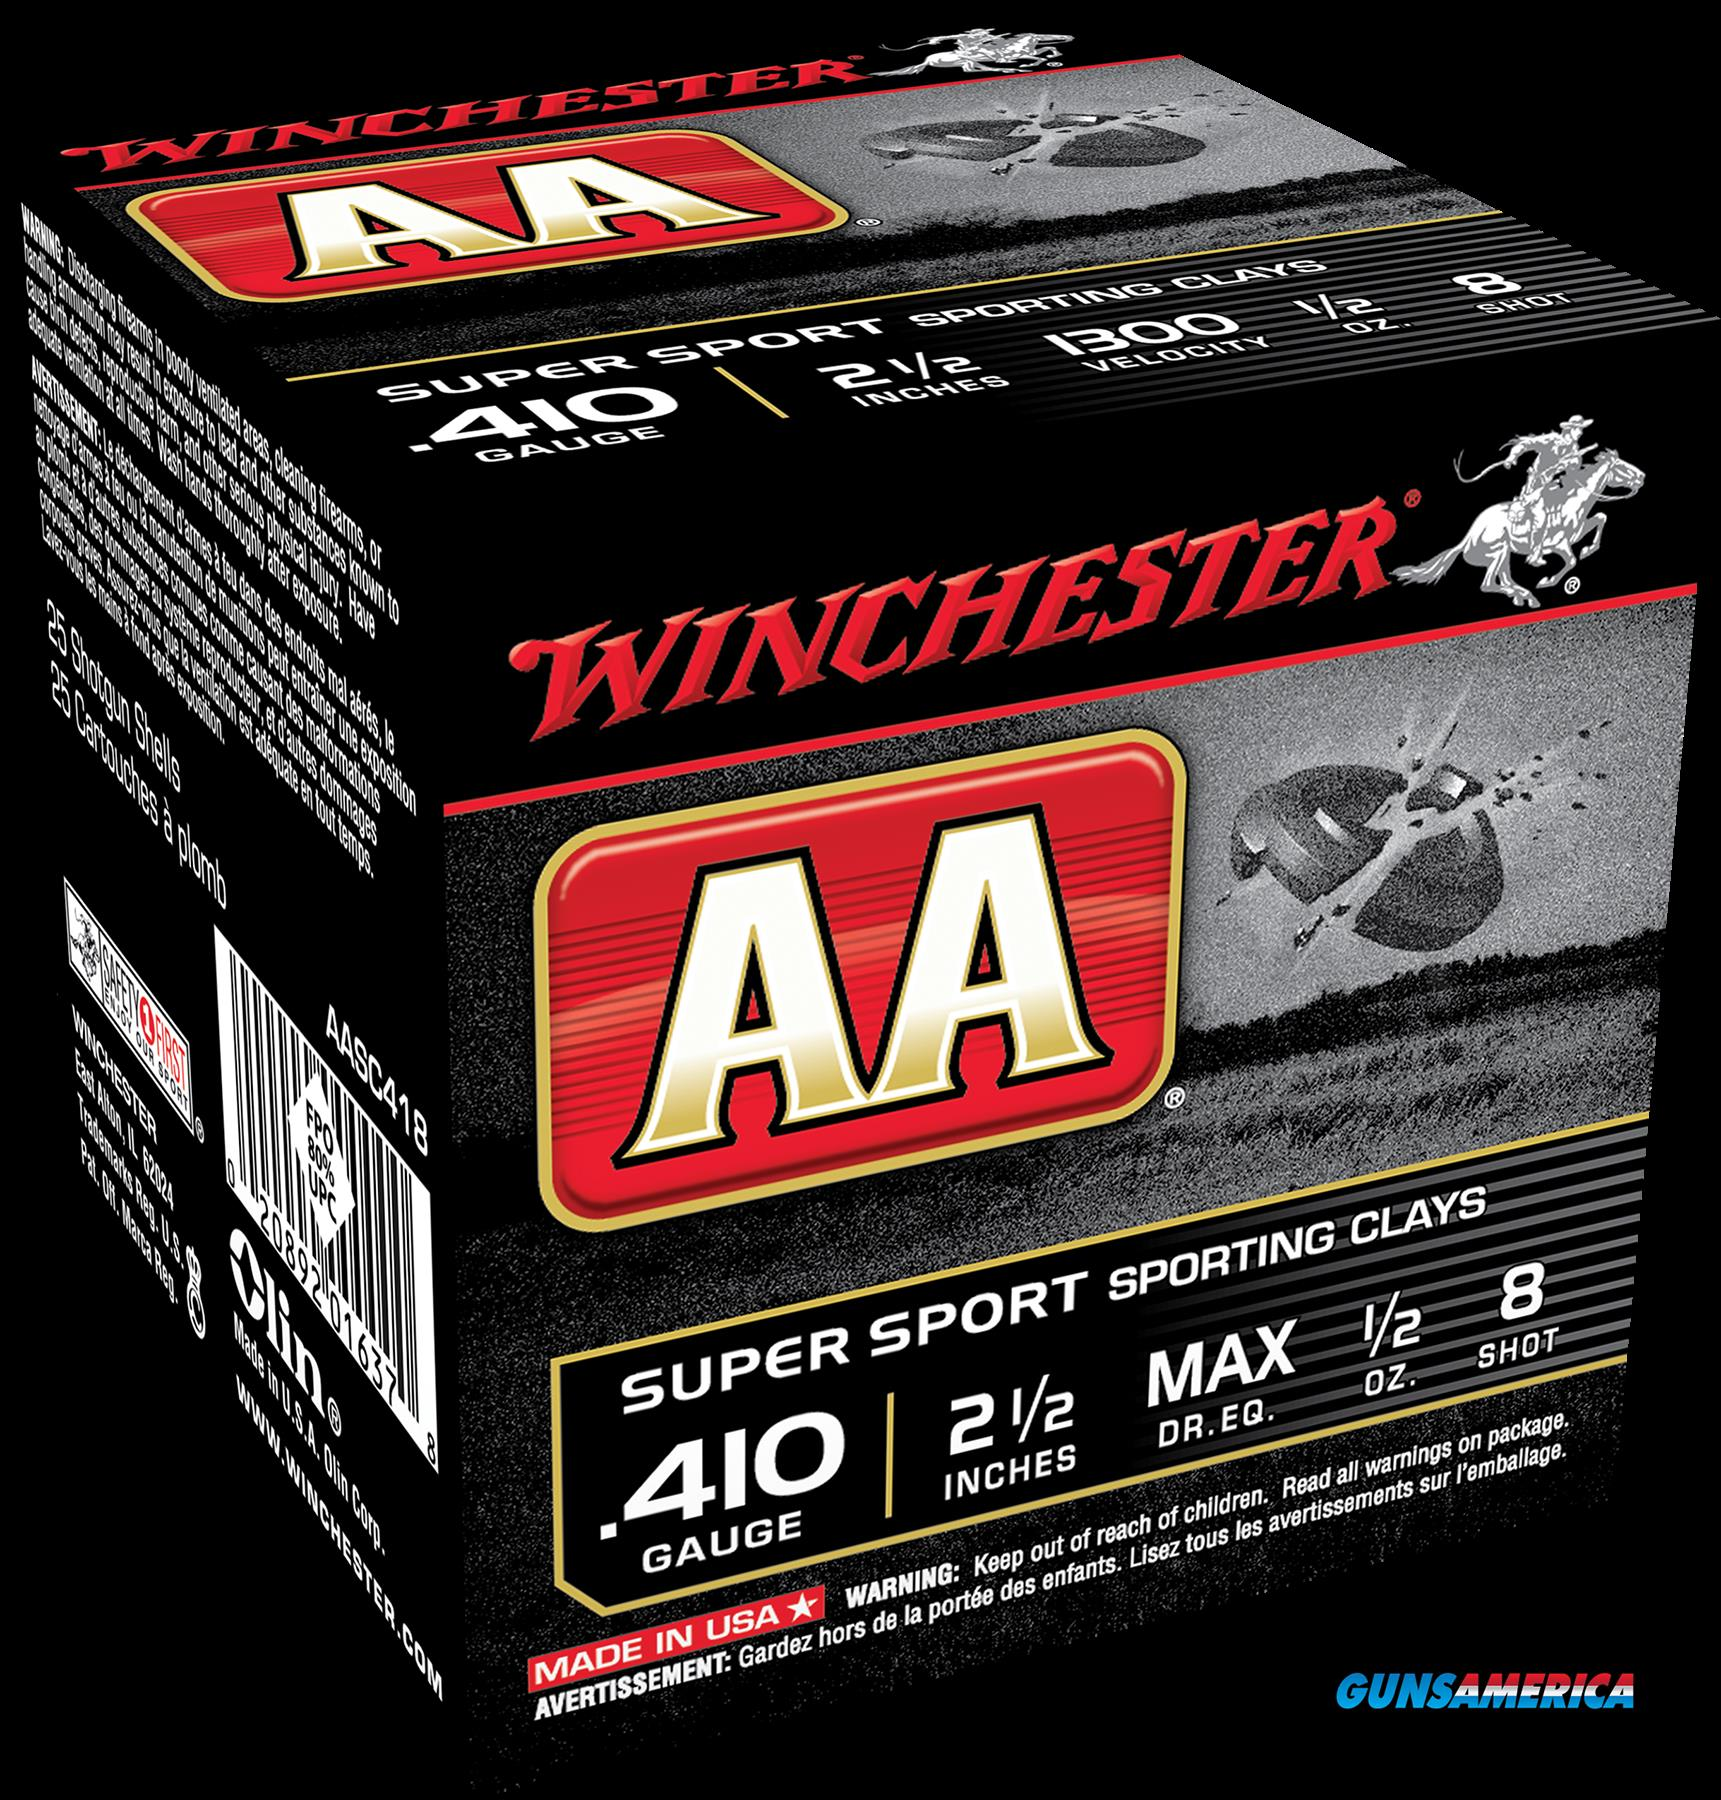 Winchester Ammo Aa, Win Aasc418    Aa Spt Cly   1-2   25-10  Guns > Pistols > 1911 Pistol Copies (non-Colt)